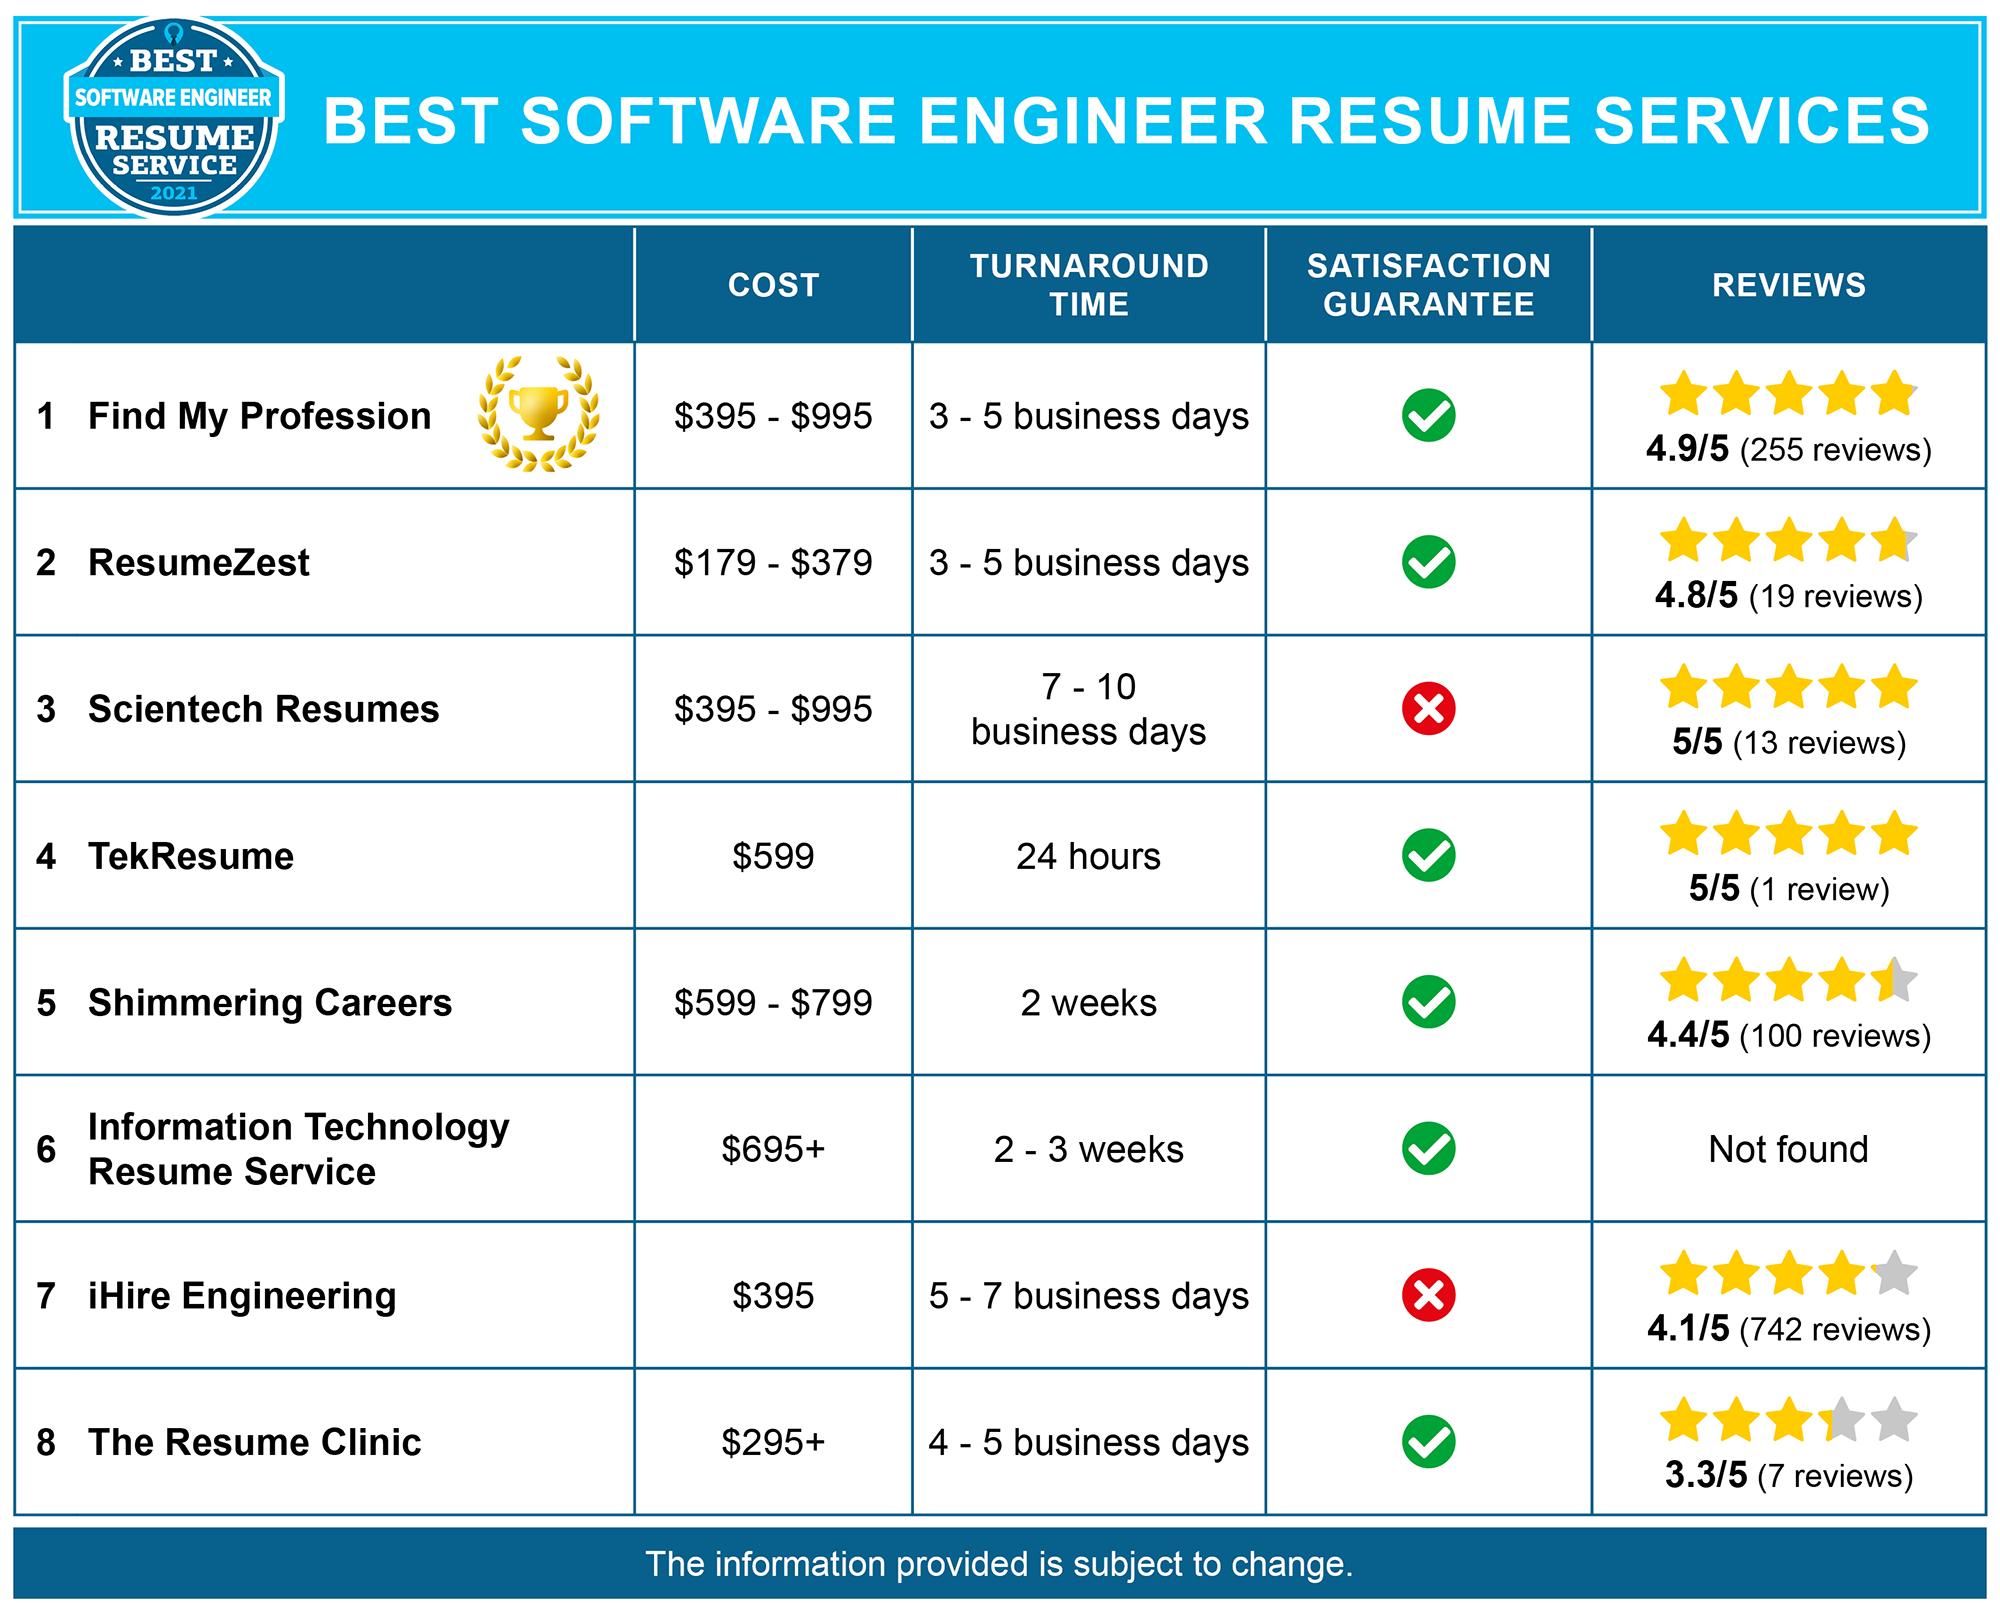 Best Software Engineer Resume Services